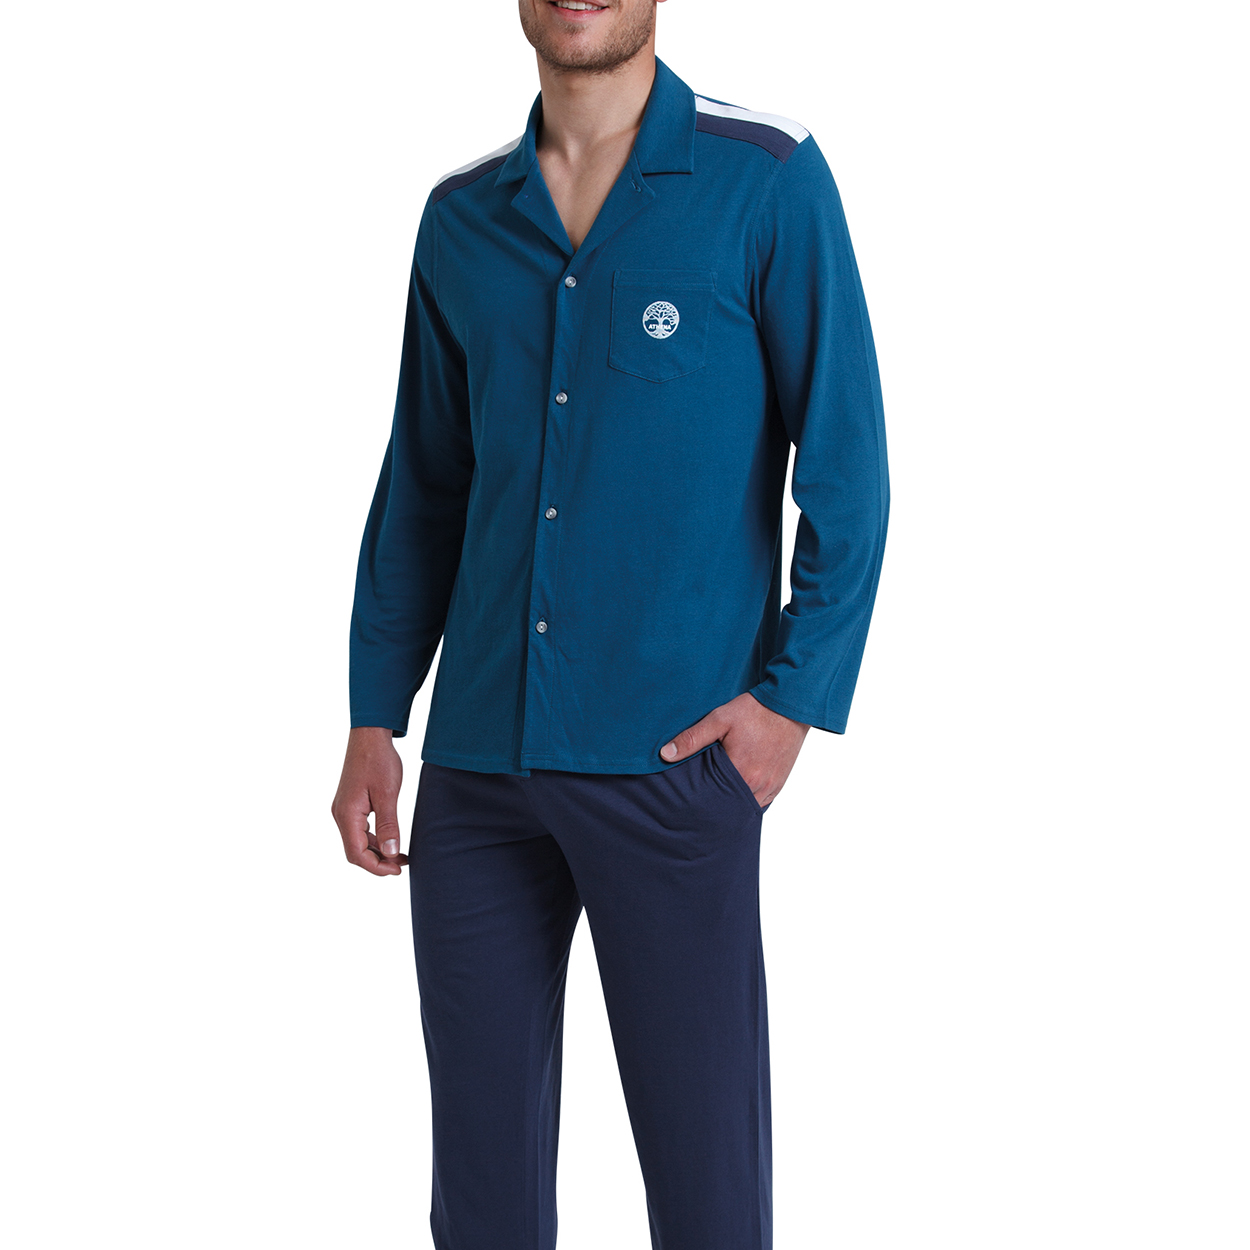 Pyjama long chemise  en coton bleu canard et bleu marine